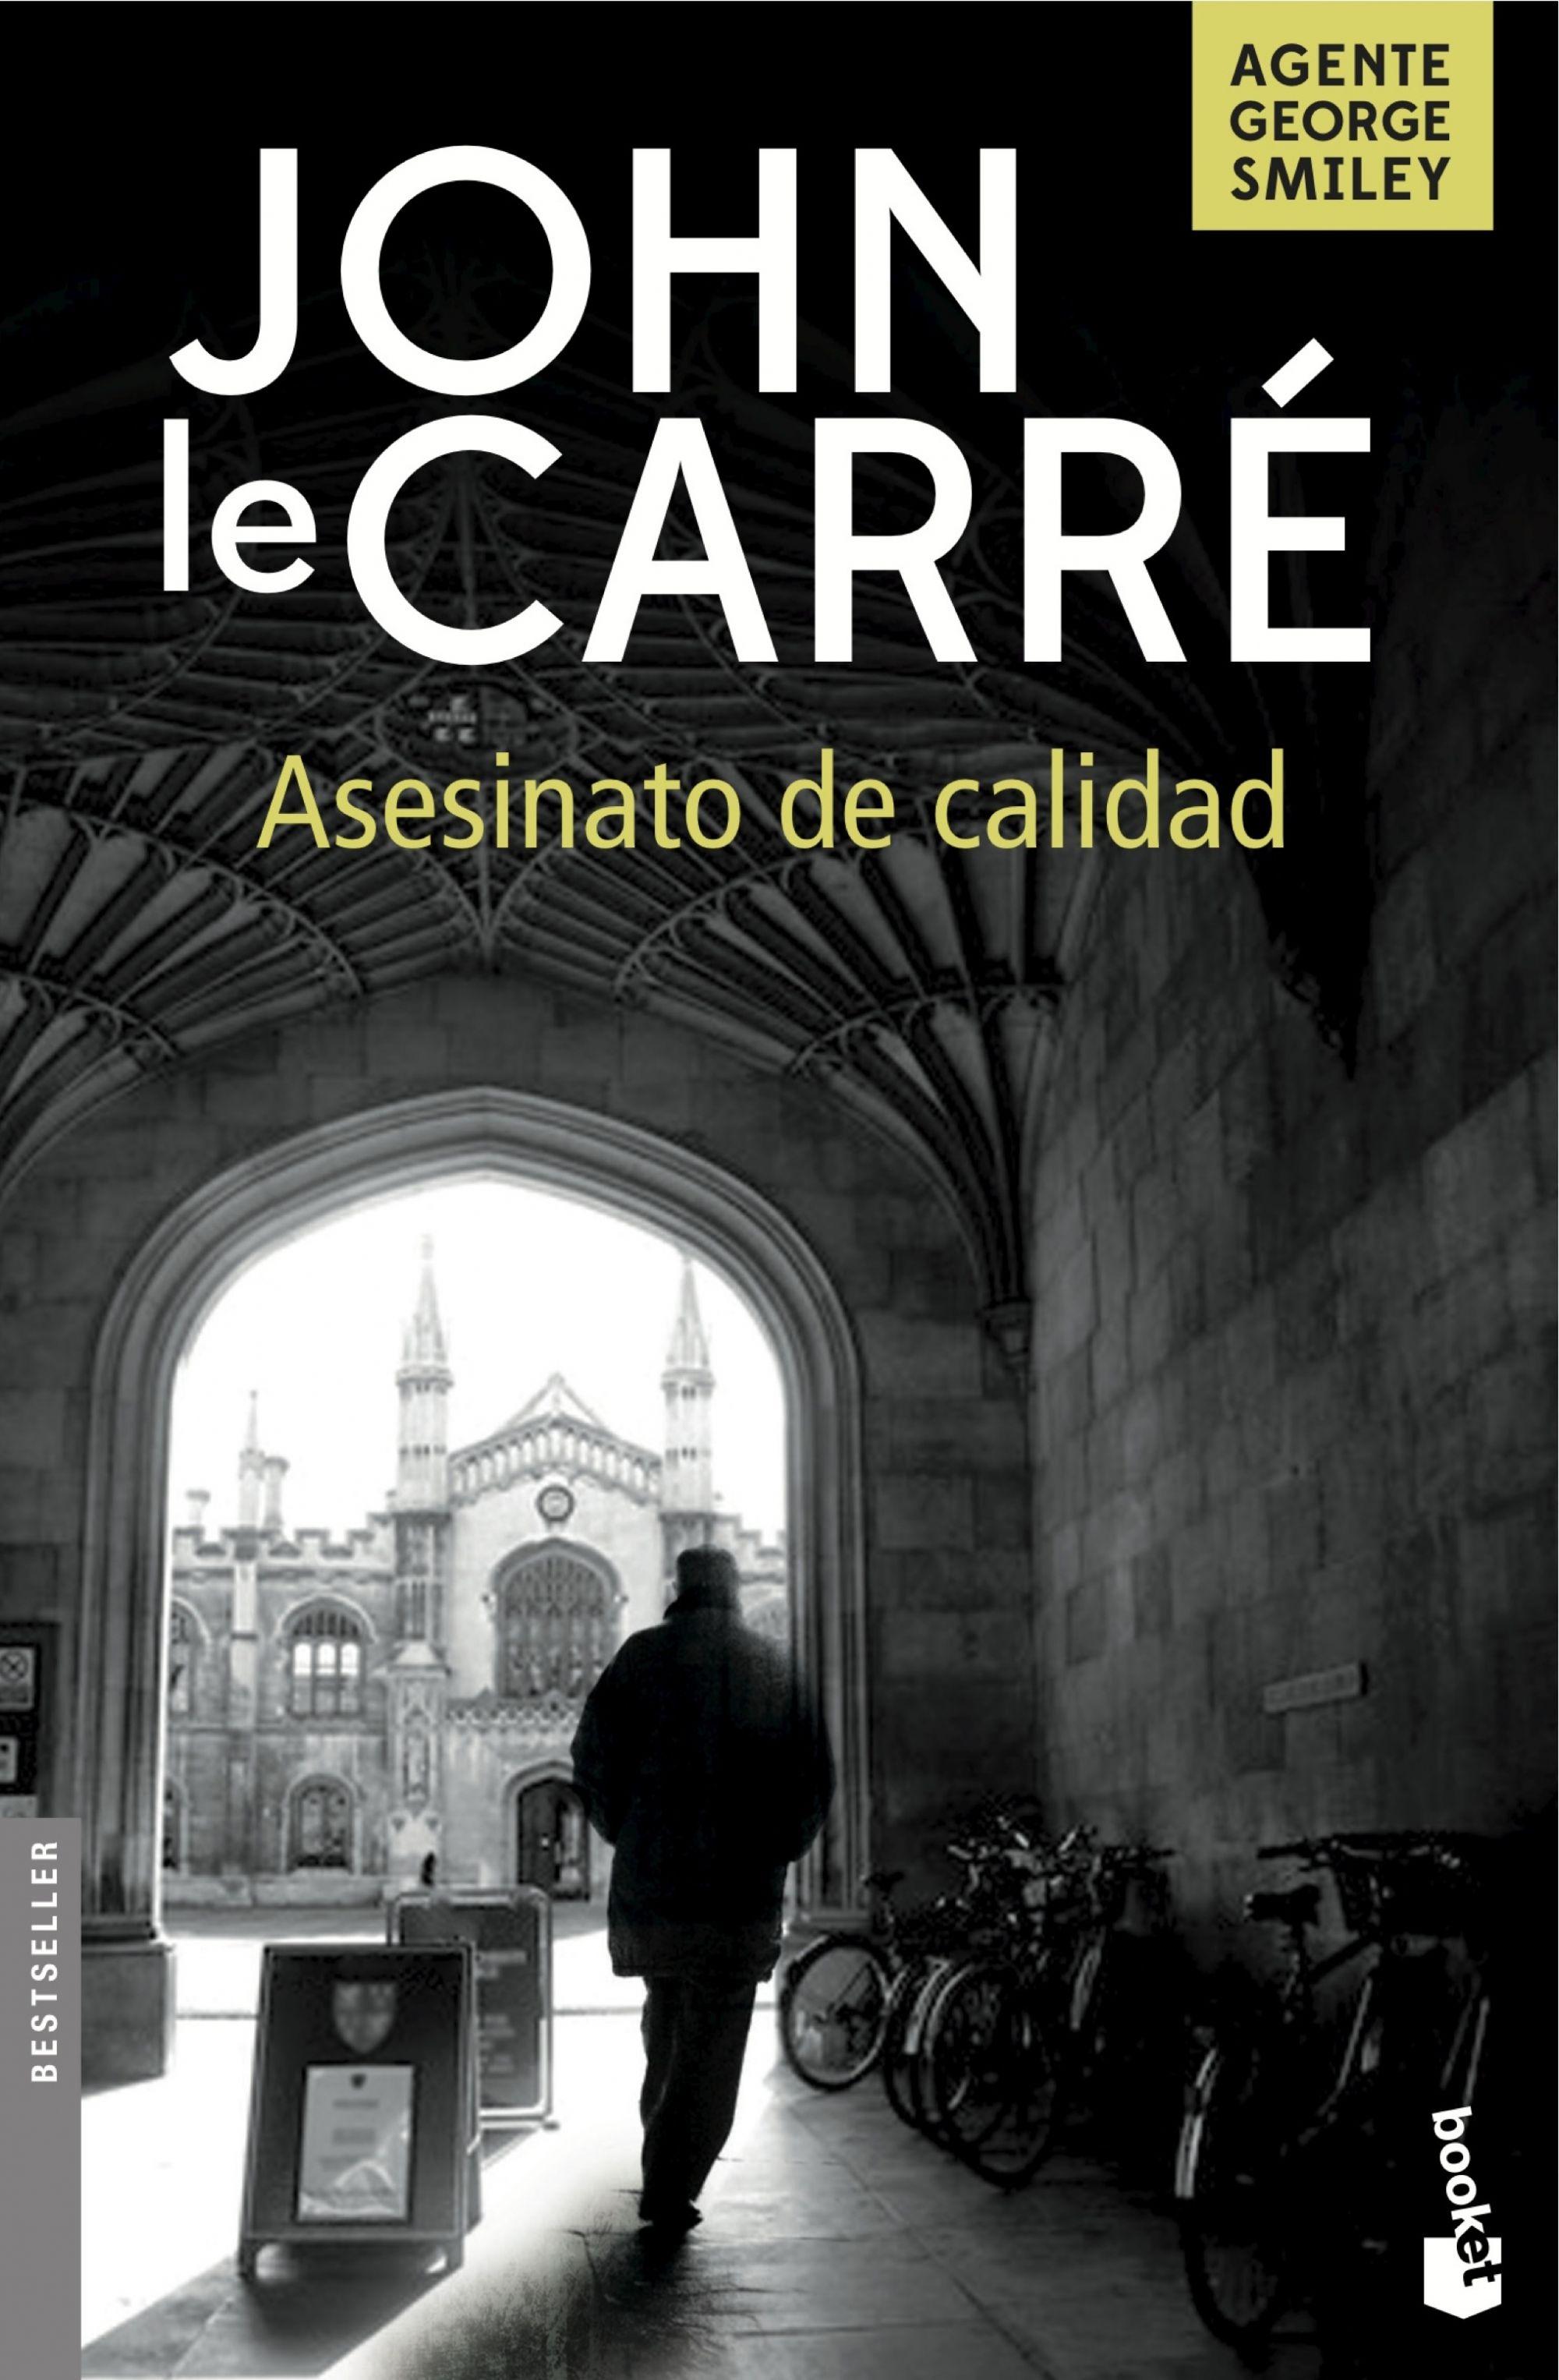 Asesinato De Calidad - Carre John Le